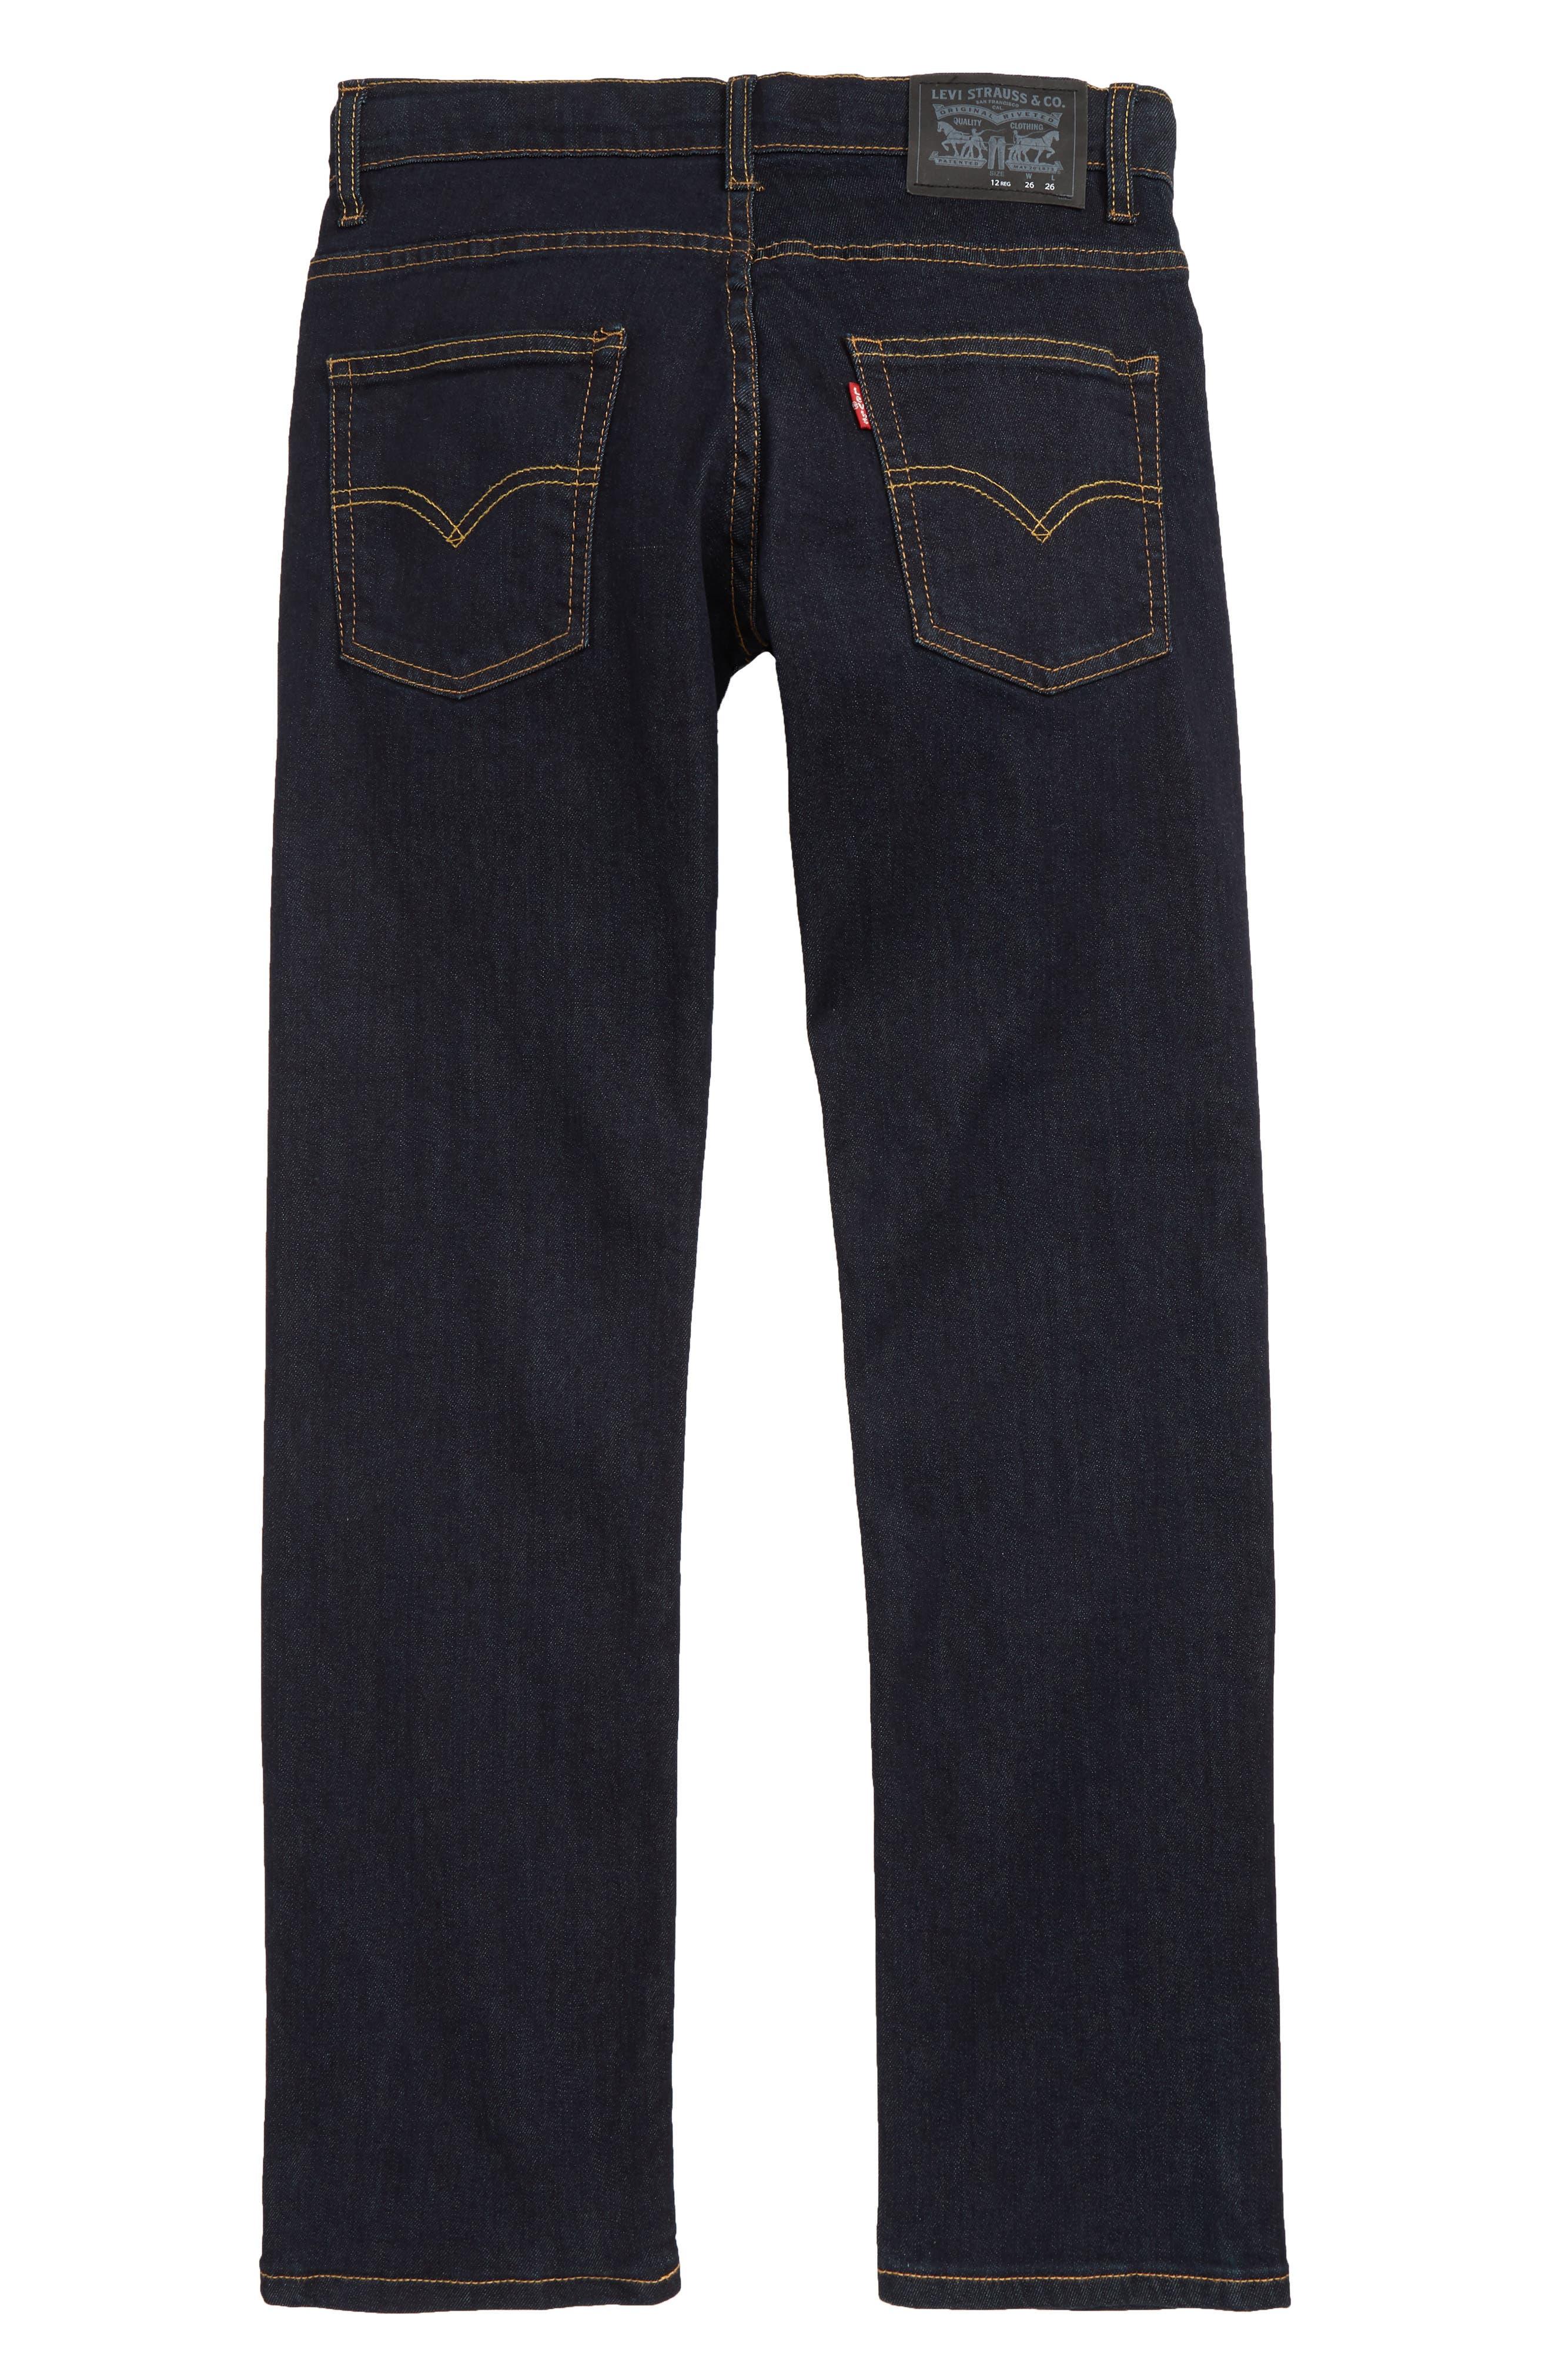 '511<sup>™</sup>' Slim Fit Jeans,                             Alternate thumbnail 2, color,                             ICE CAP